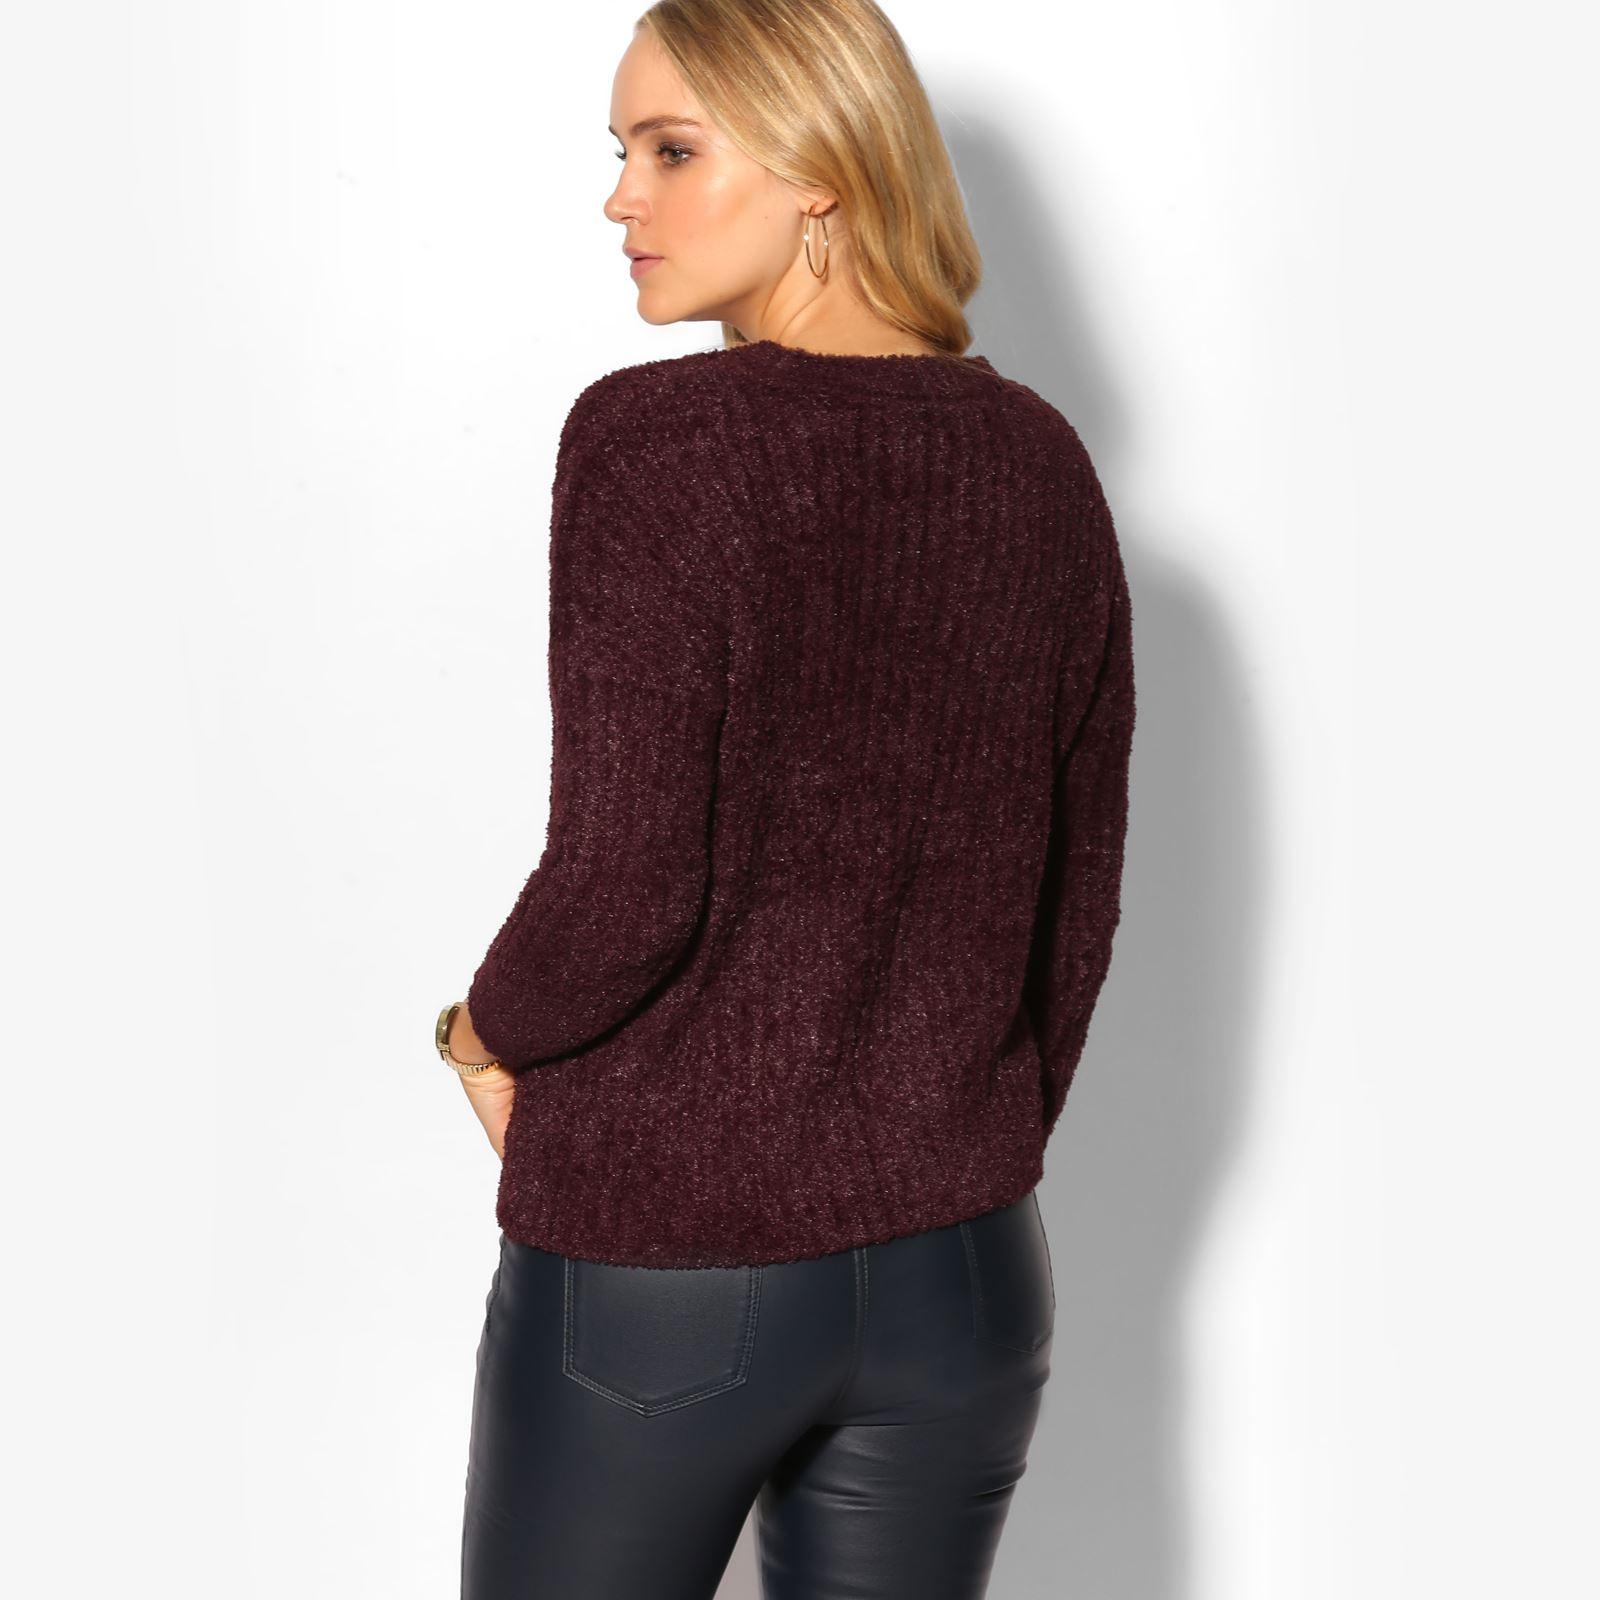 c335edadc2 Women Ladies Fluffy Knit Long Sleeve Xmas Jumper Winter Sweater ...